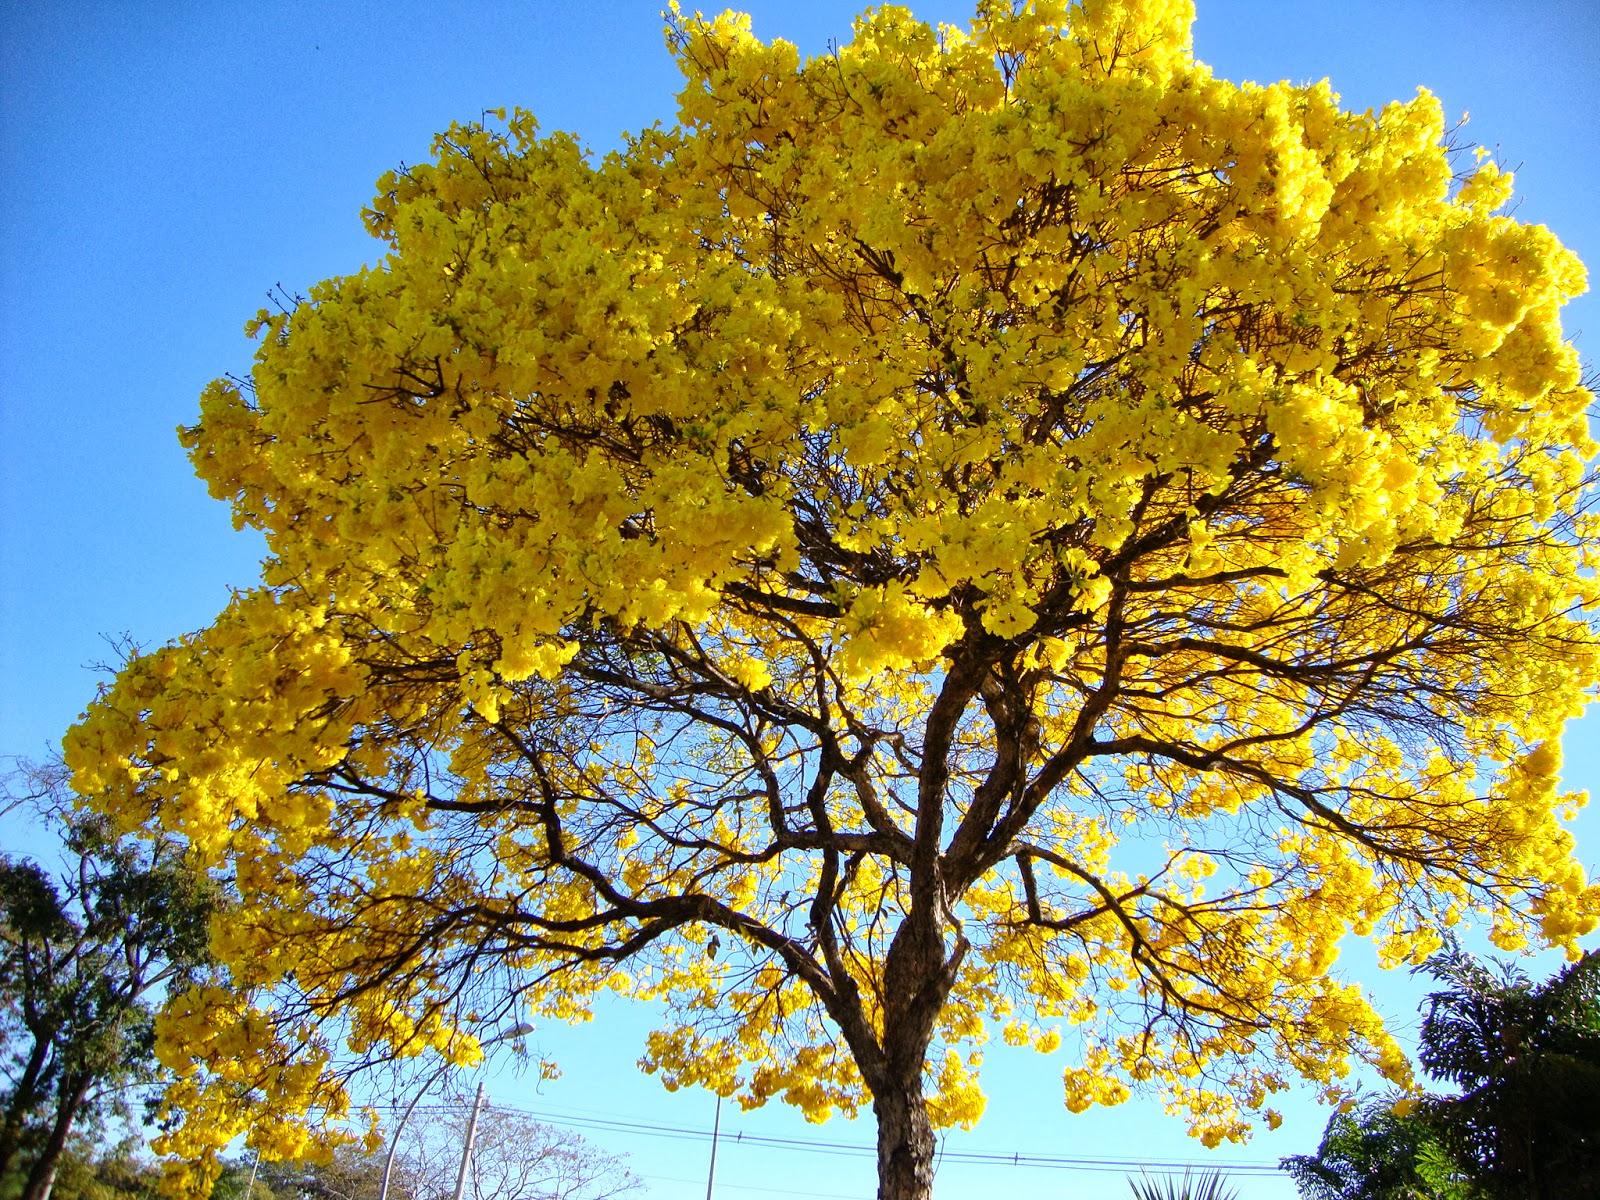 ipê-amarelo-árvores-no-quintal-de-casa